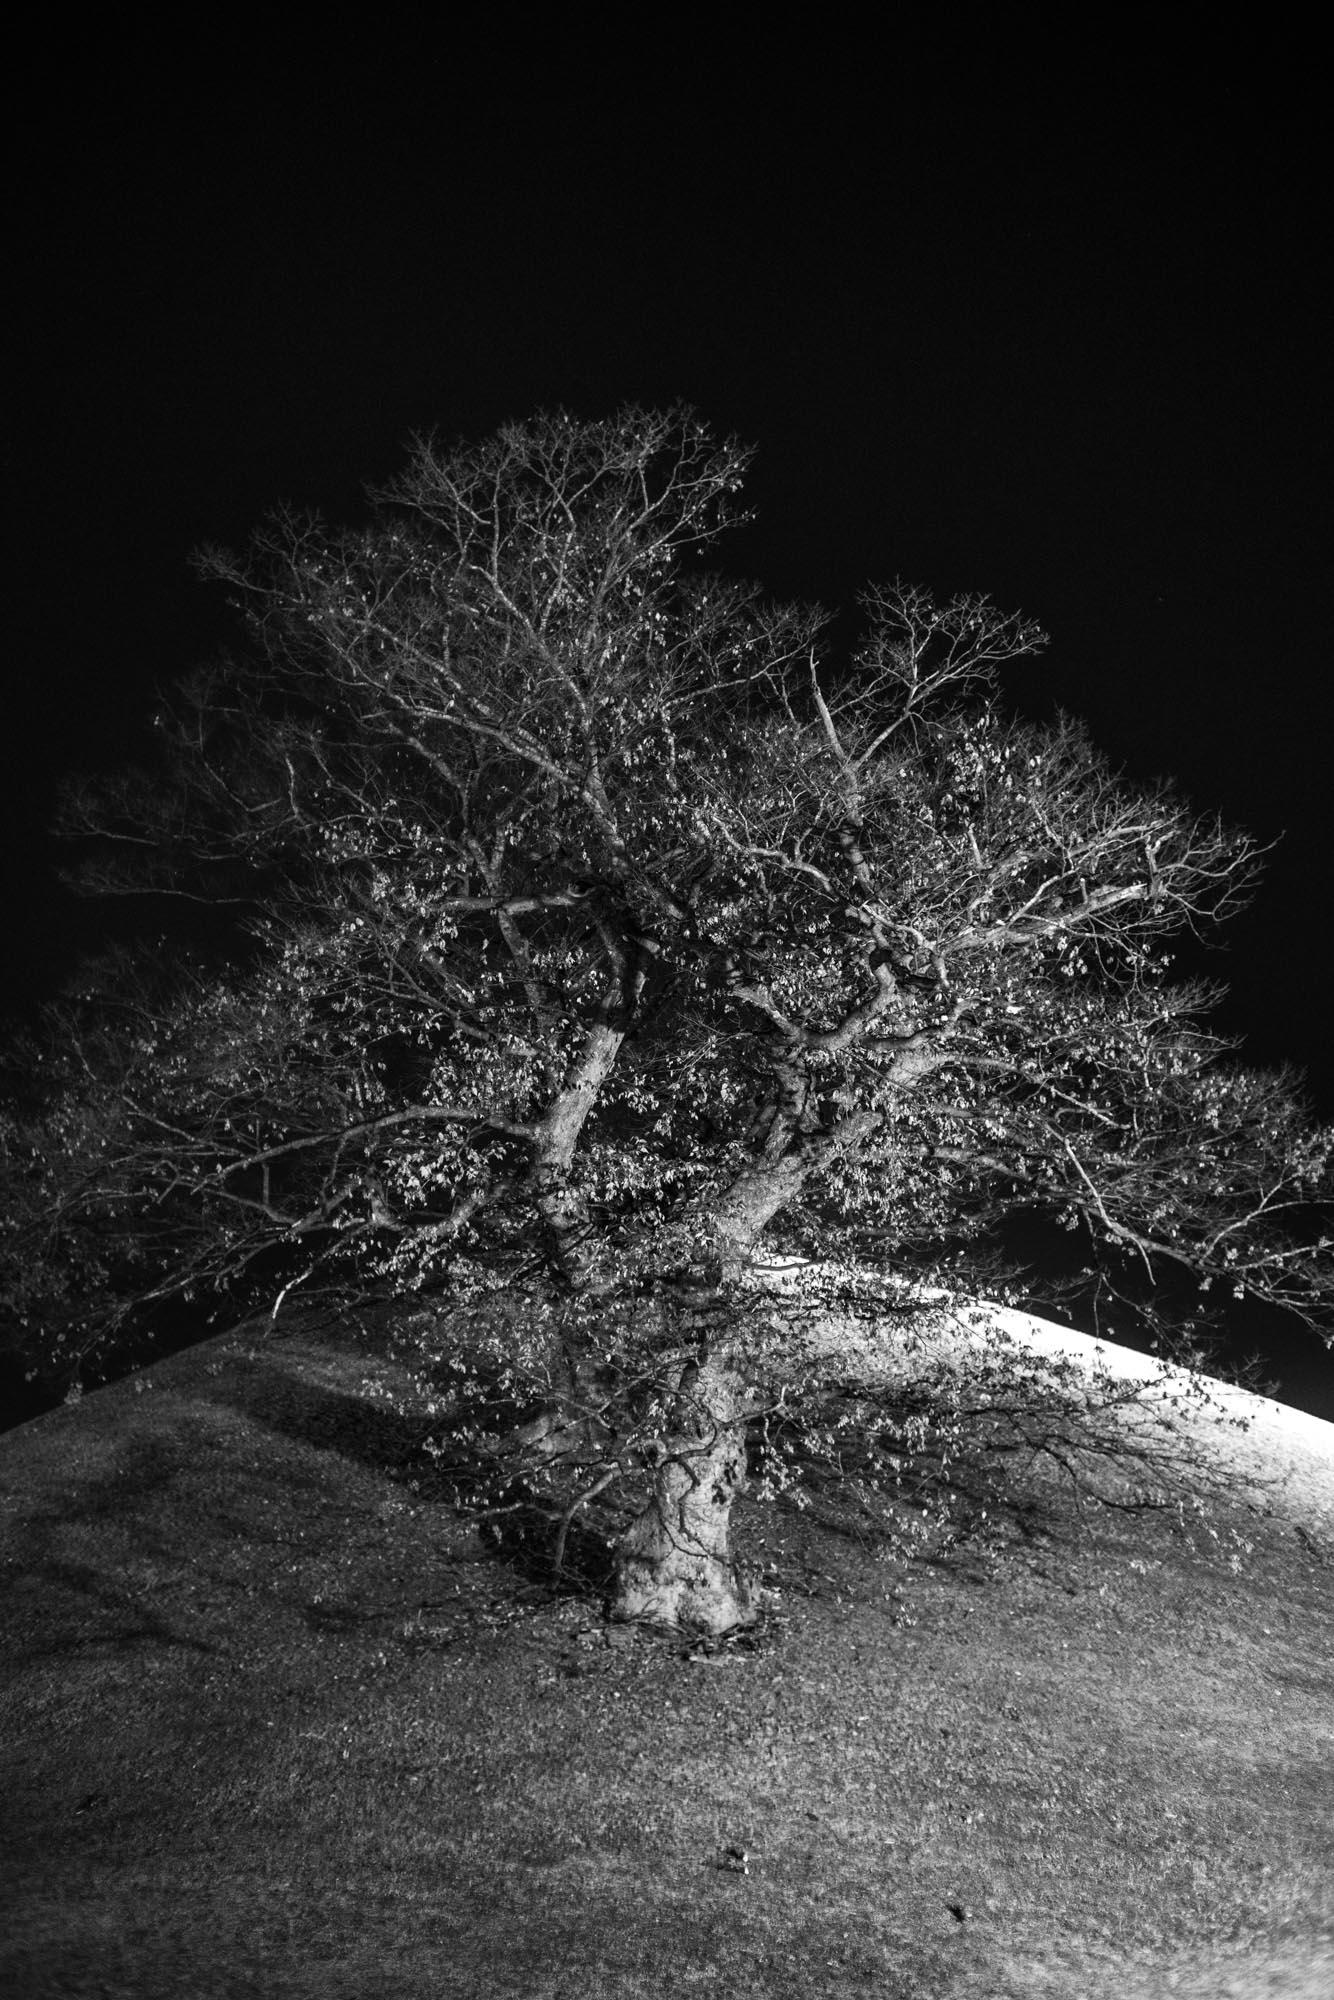 gyeongju-day-night-denis-bosnic-13.jpg